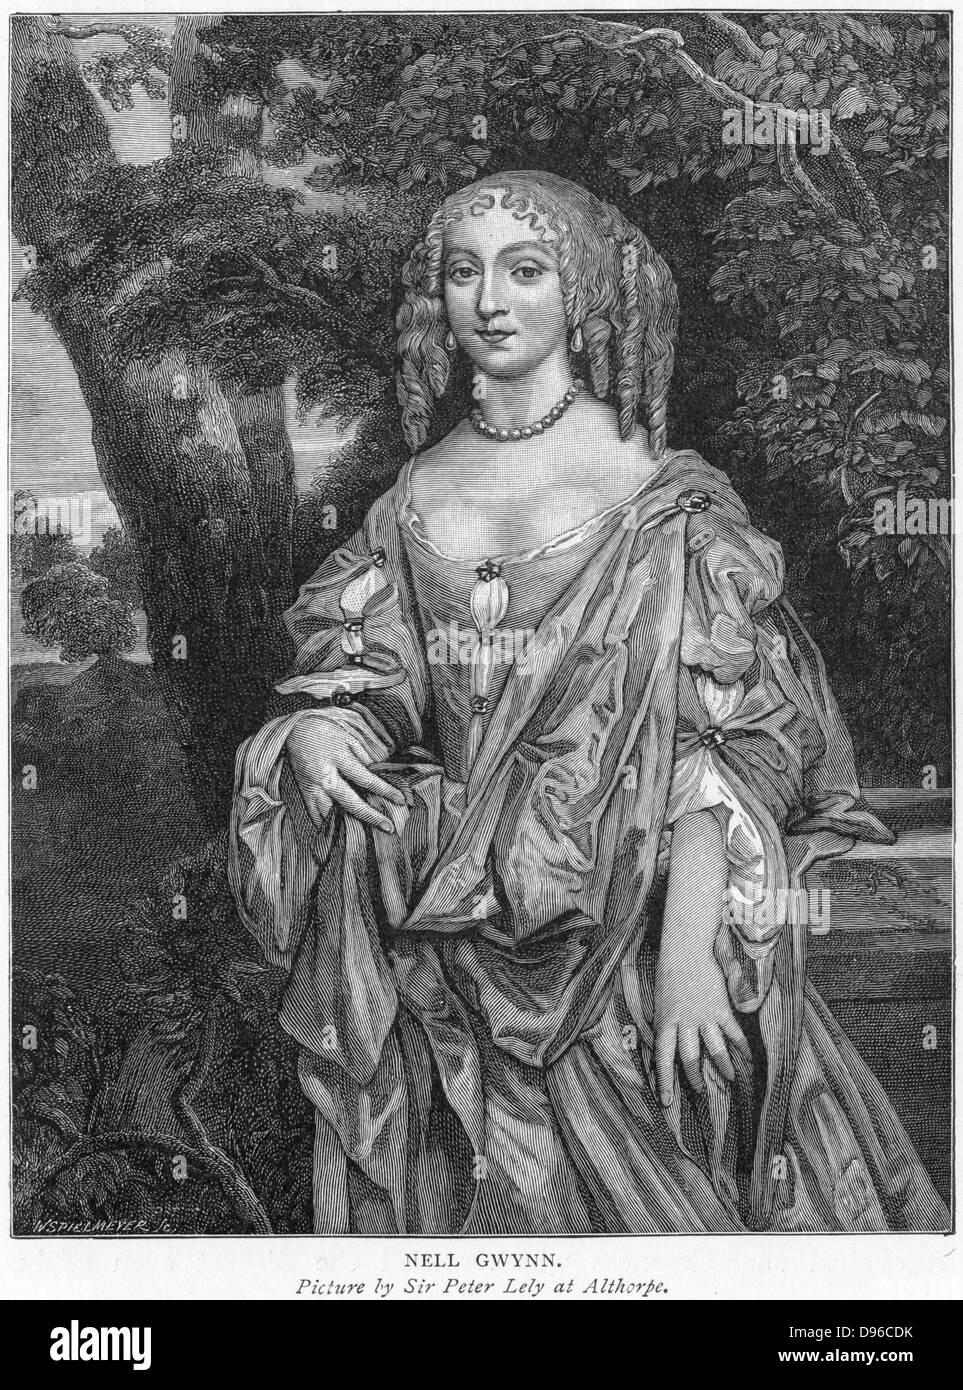 Nell Gwyn (c1650-1687), actrice comique Anglais: maîtresse de Charles II. La gravure. Photo Stock